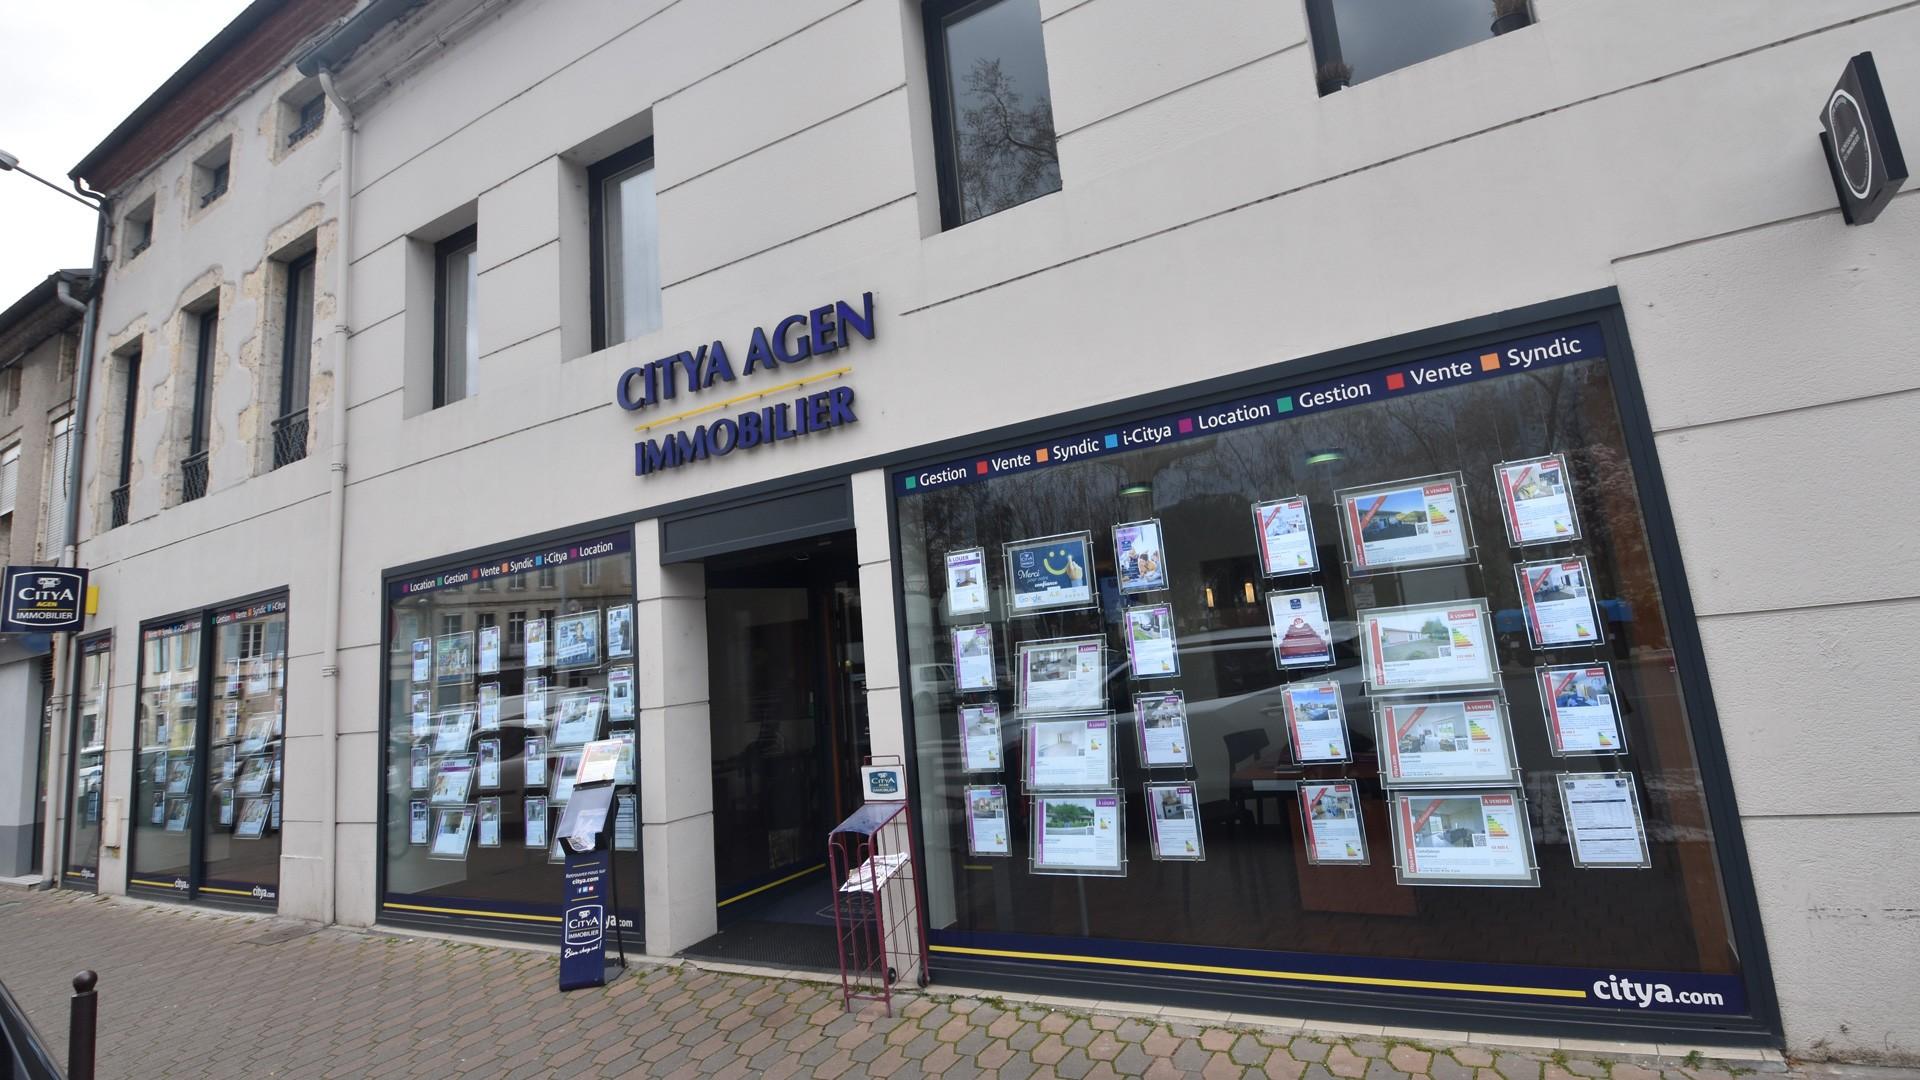 Agence immo Citya Agen